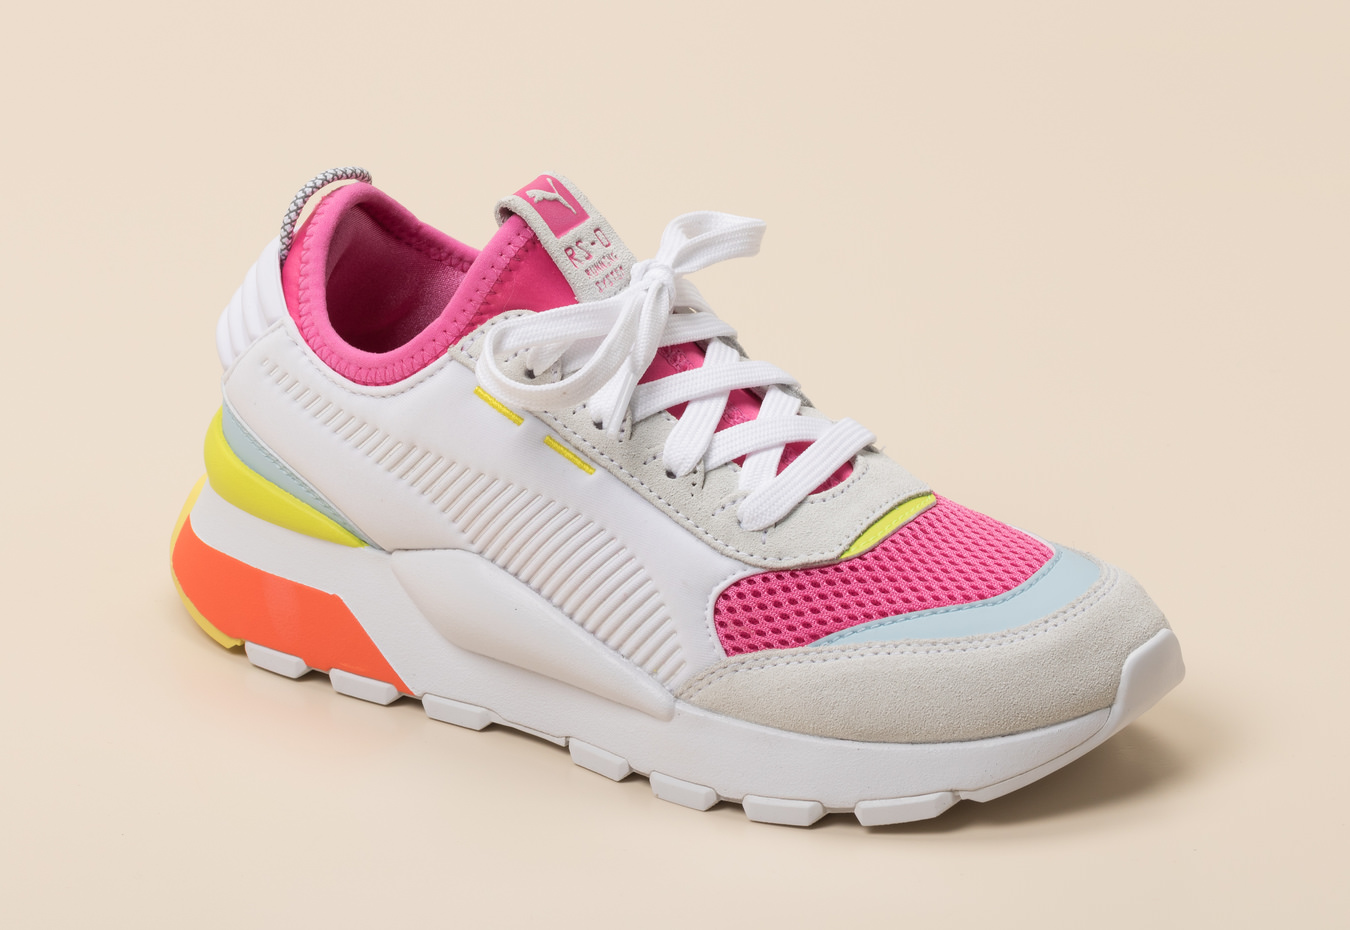 Puma Damen Sneaker in multibunt kaufen | Zumnorde Online Shop